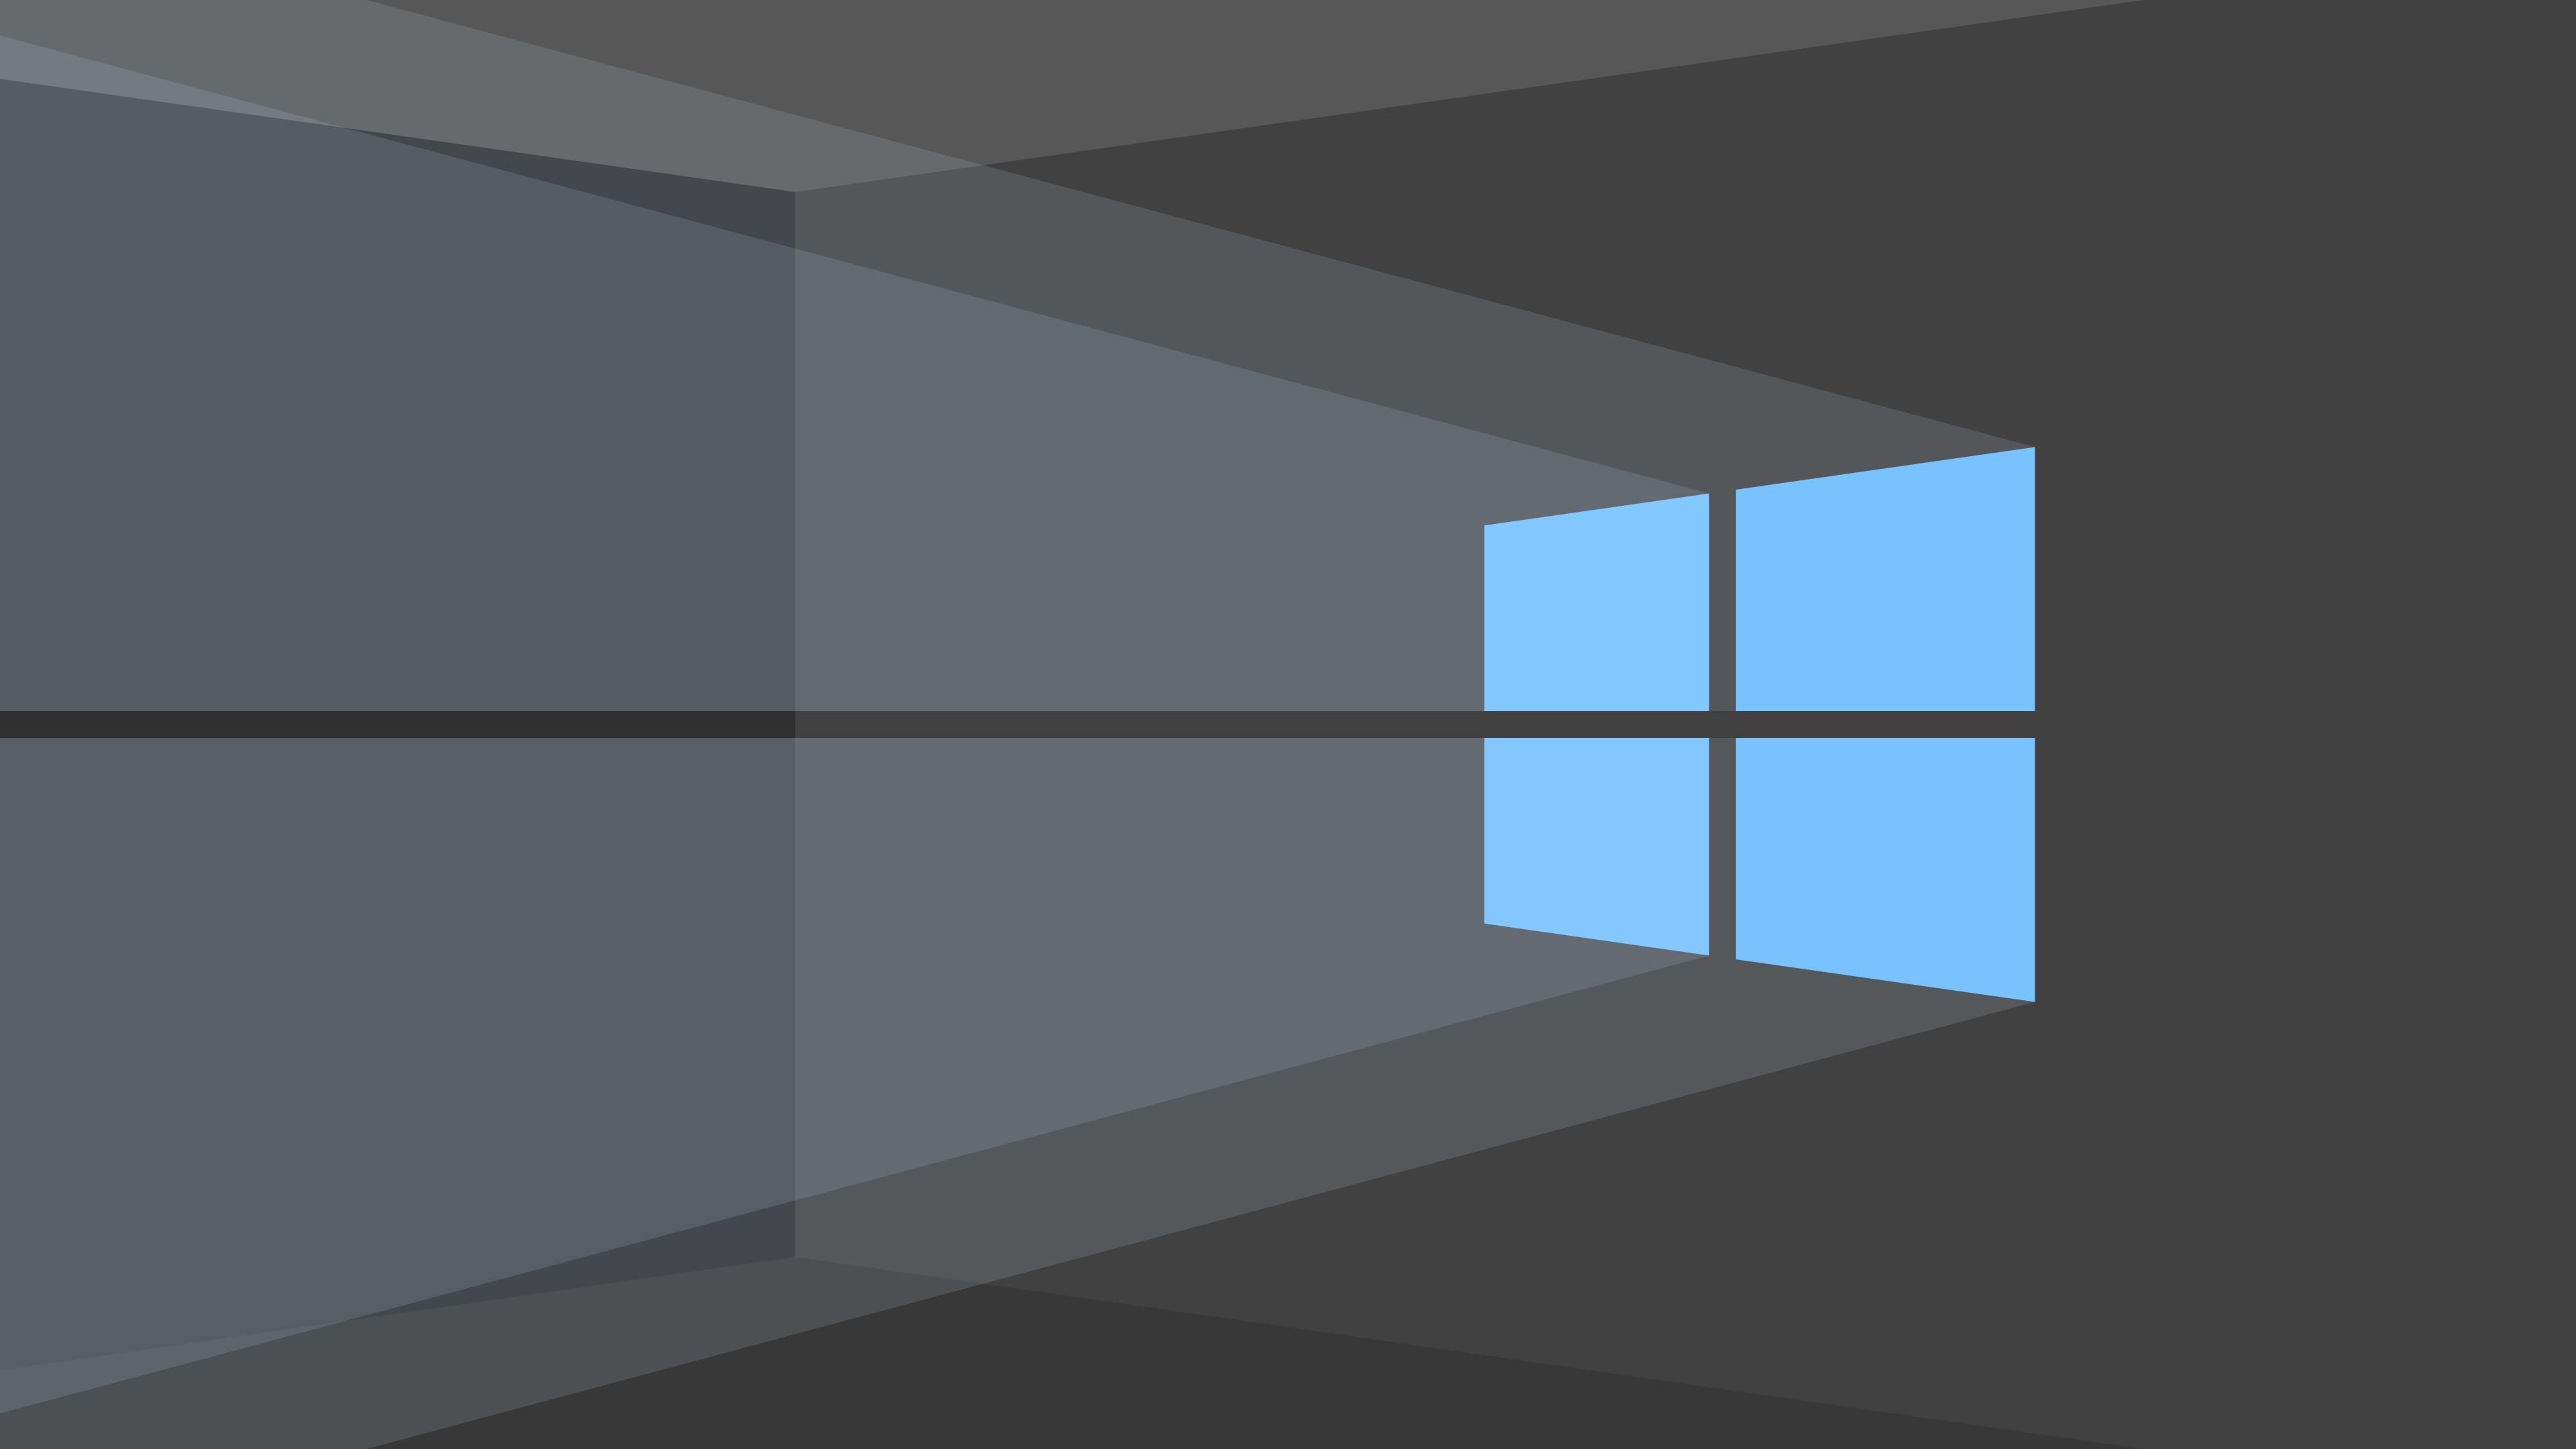 Cute Birds Wallpapers For Desktop Windows 10 Minimalism 4k Hd Computer 4k Wallpapers